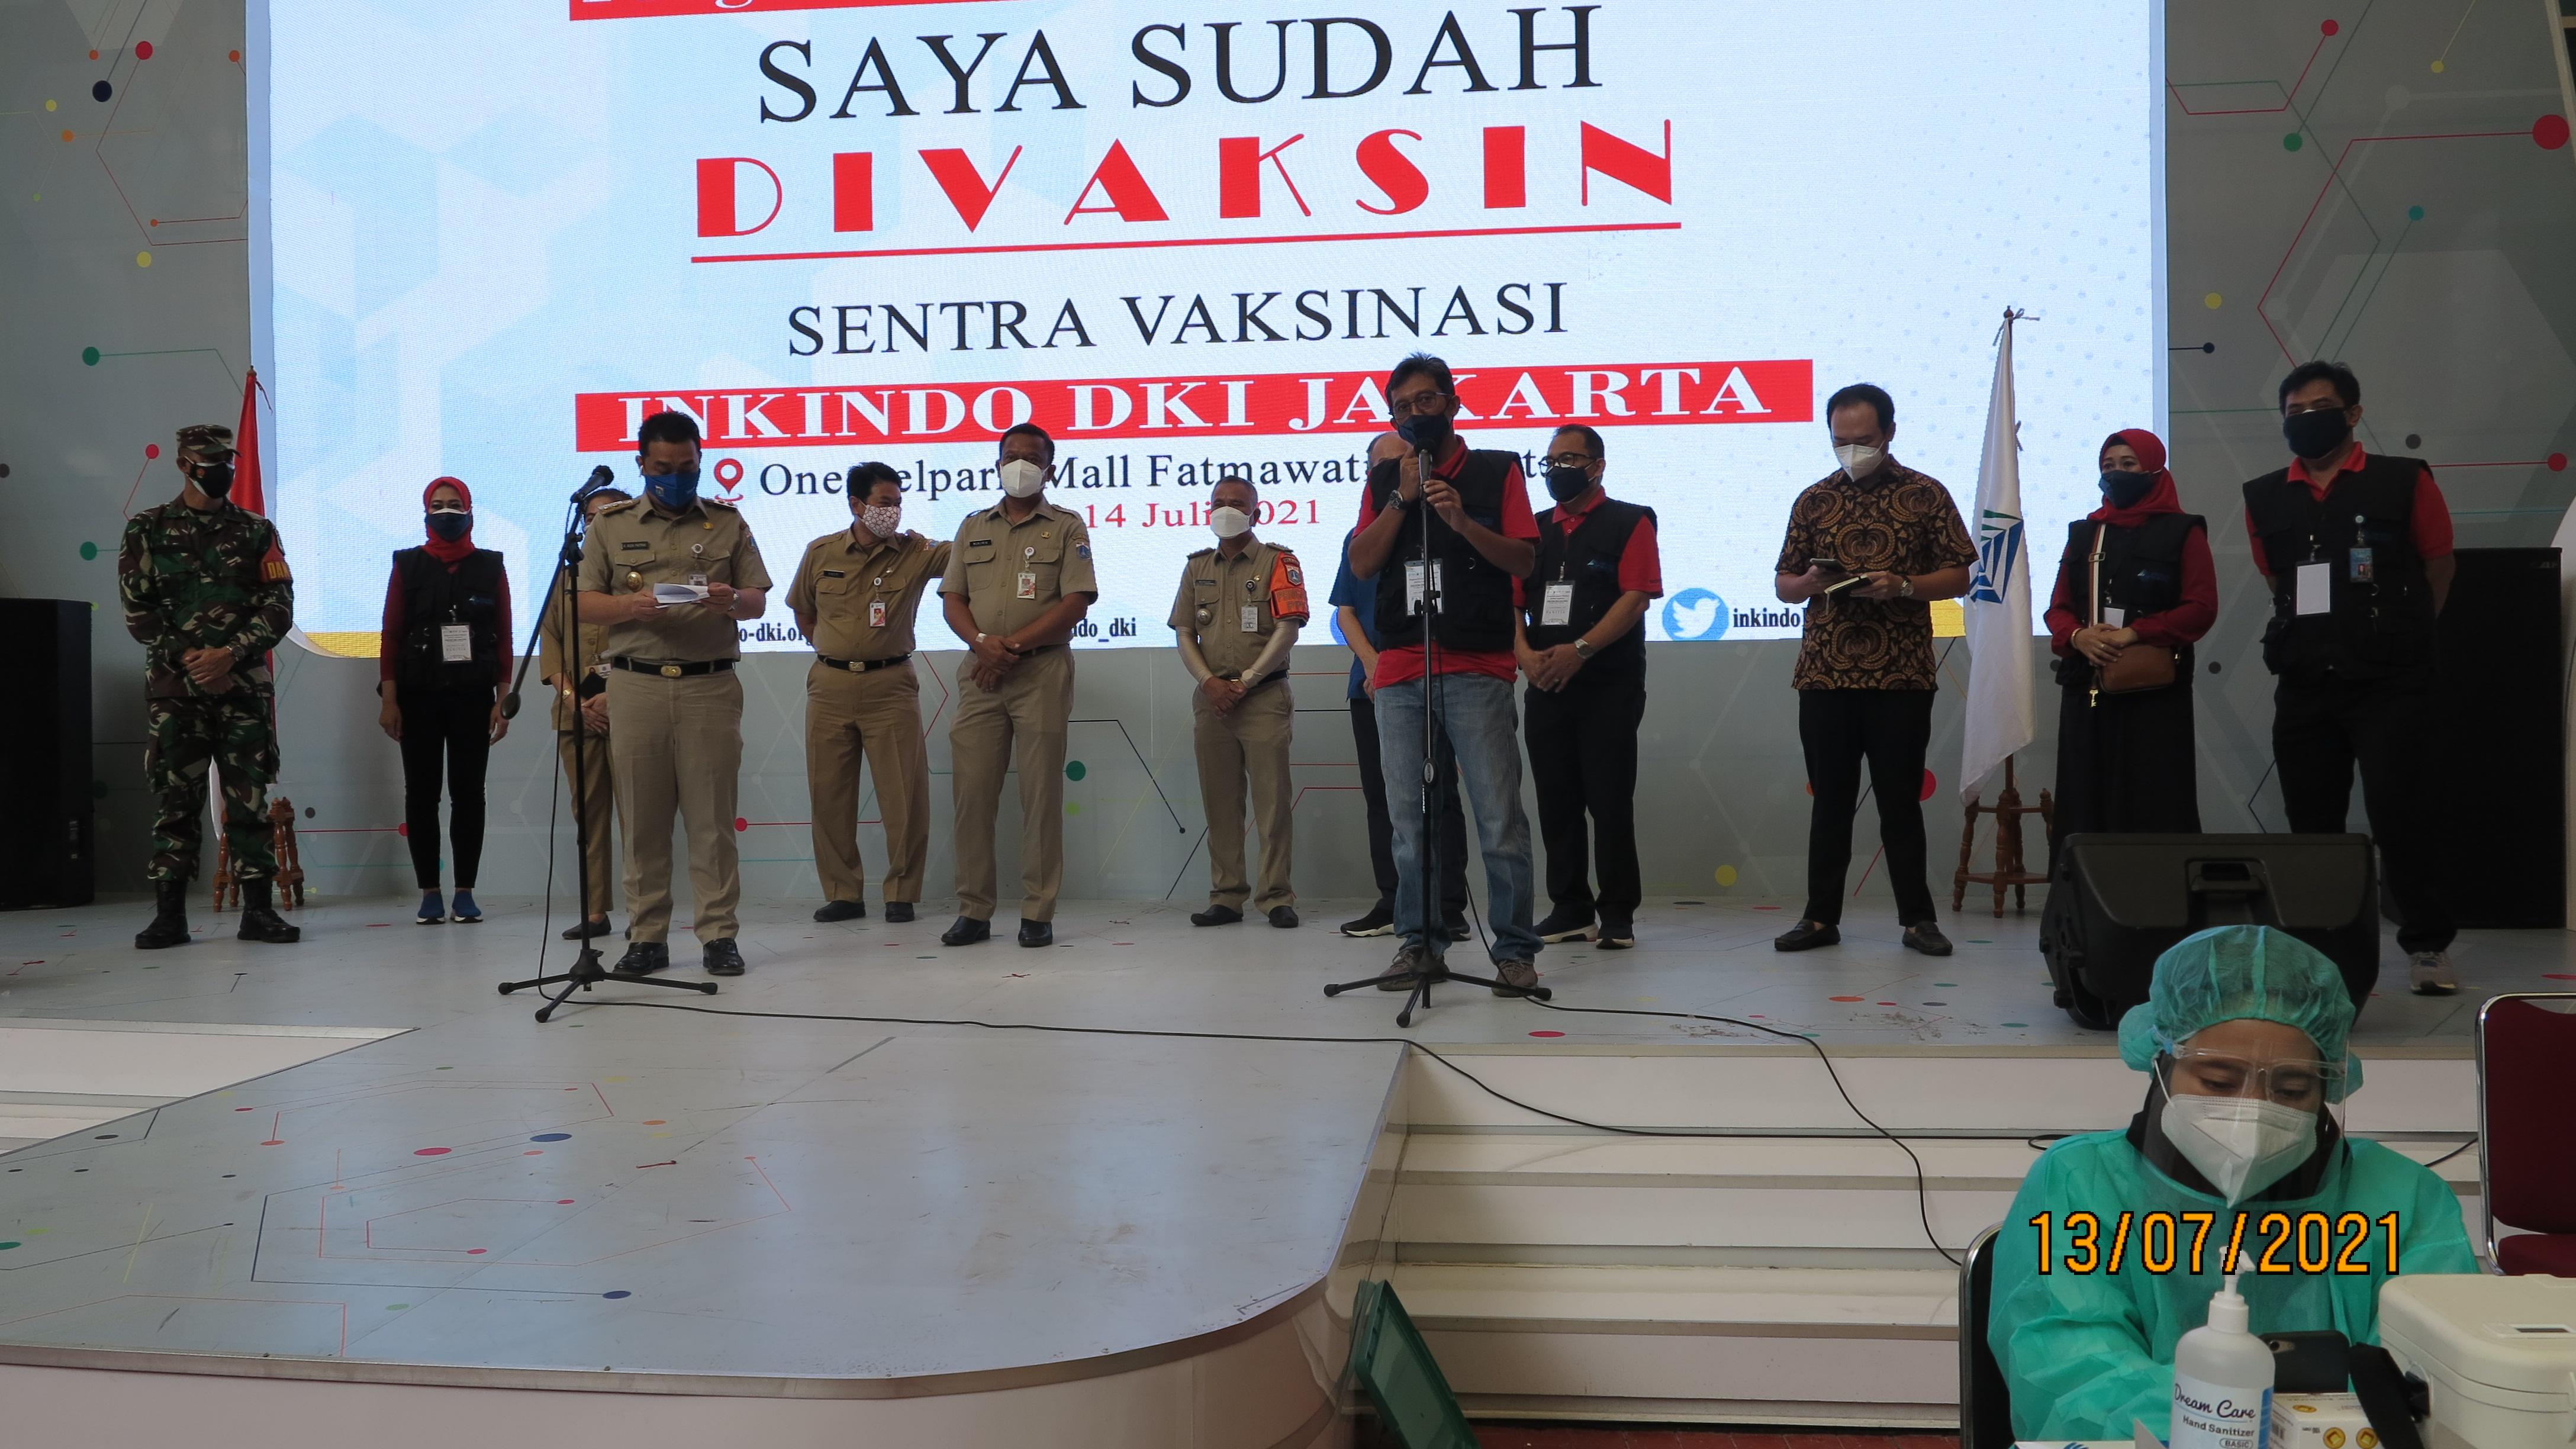 INKINDO DKI Jakarta Gelar Sentra Vaksinasi Massal Tahap 1  sebanyak 1000 orang <h6>13-14 Juli 2021</h6>